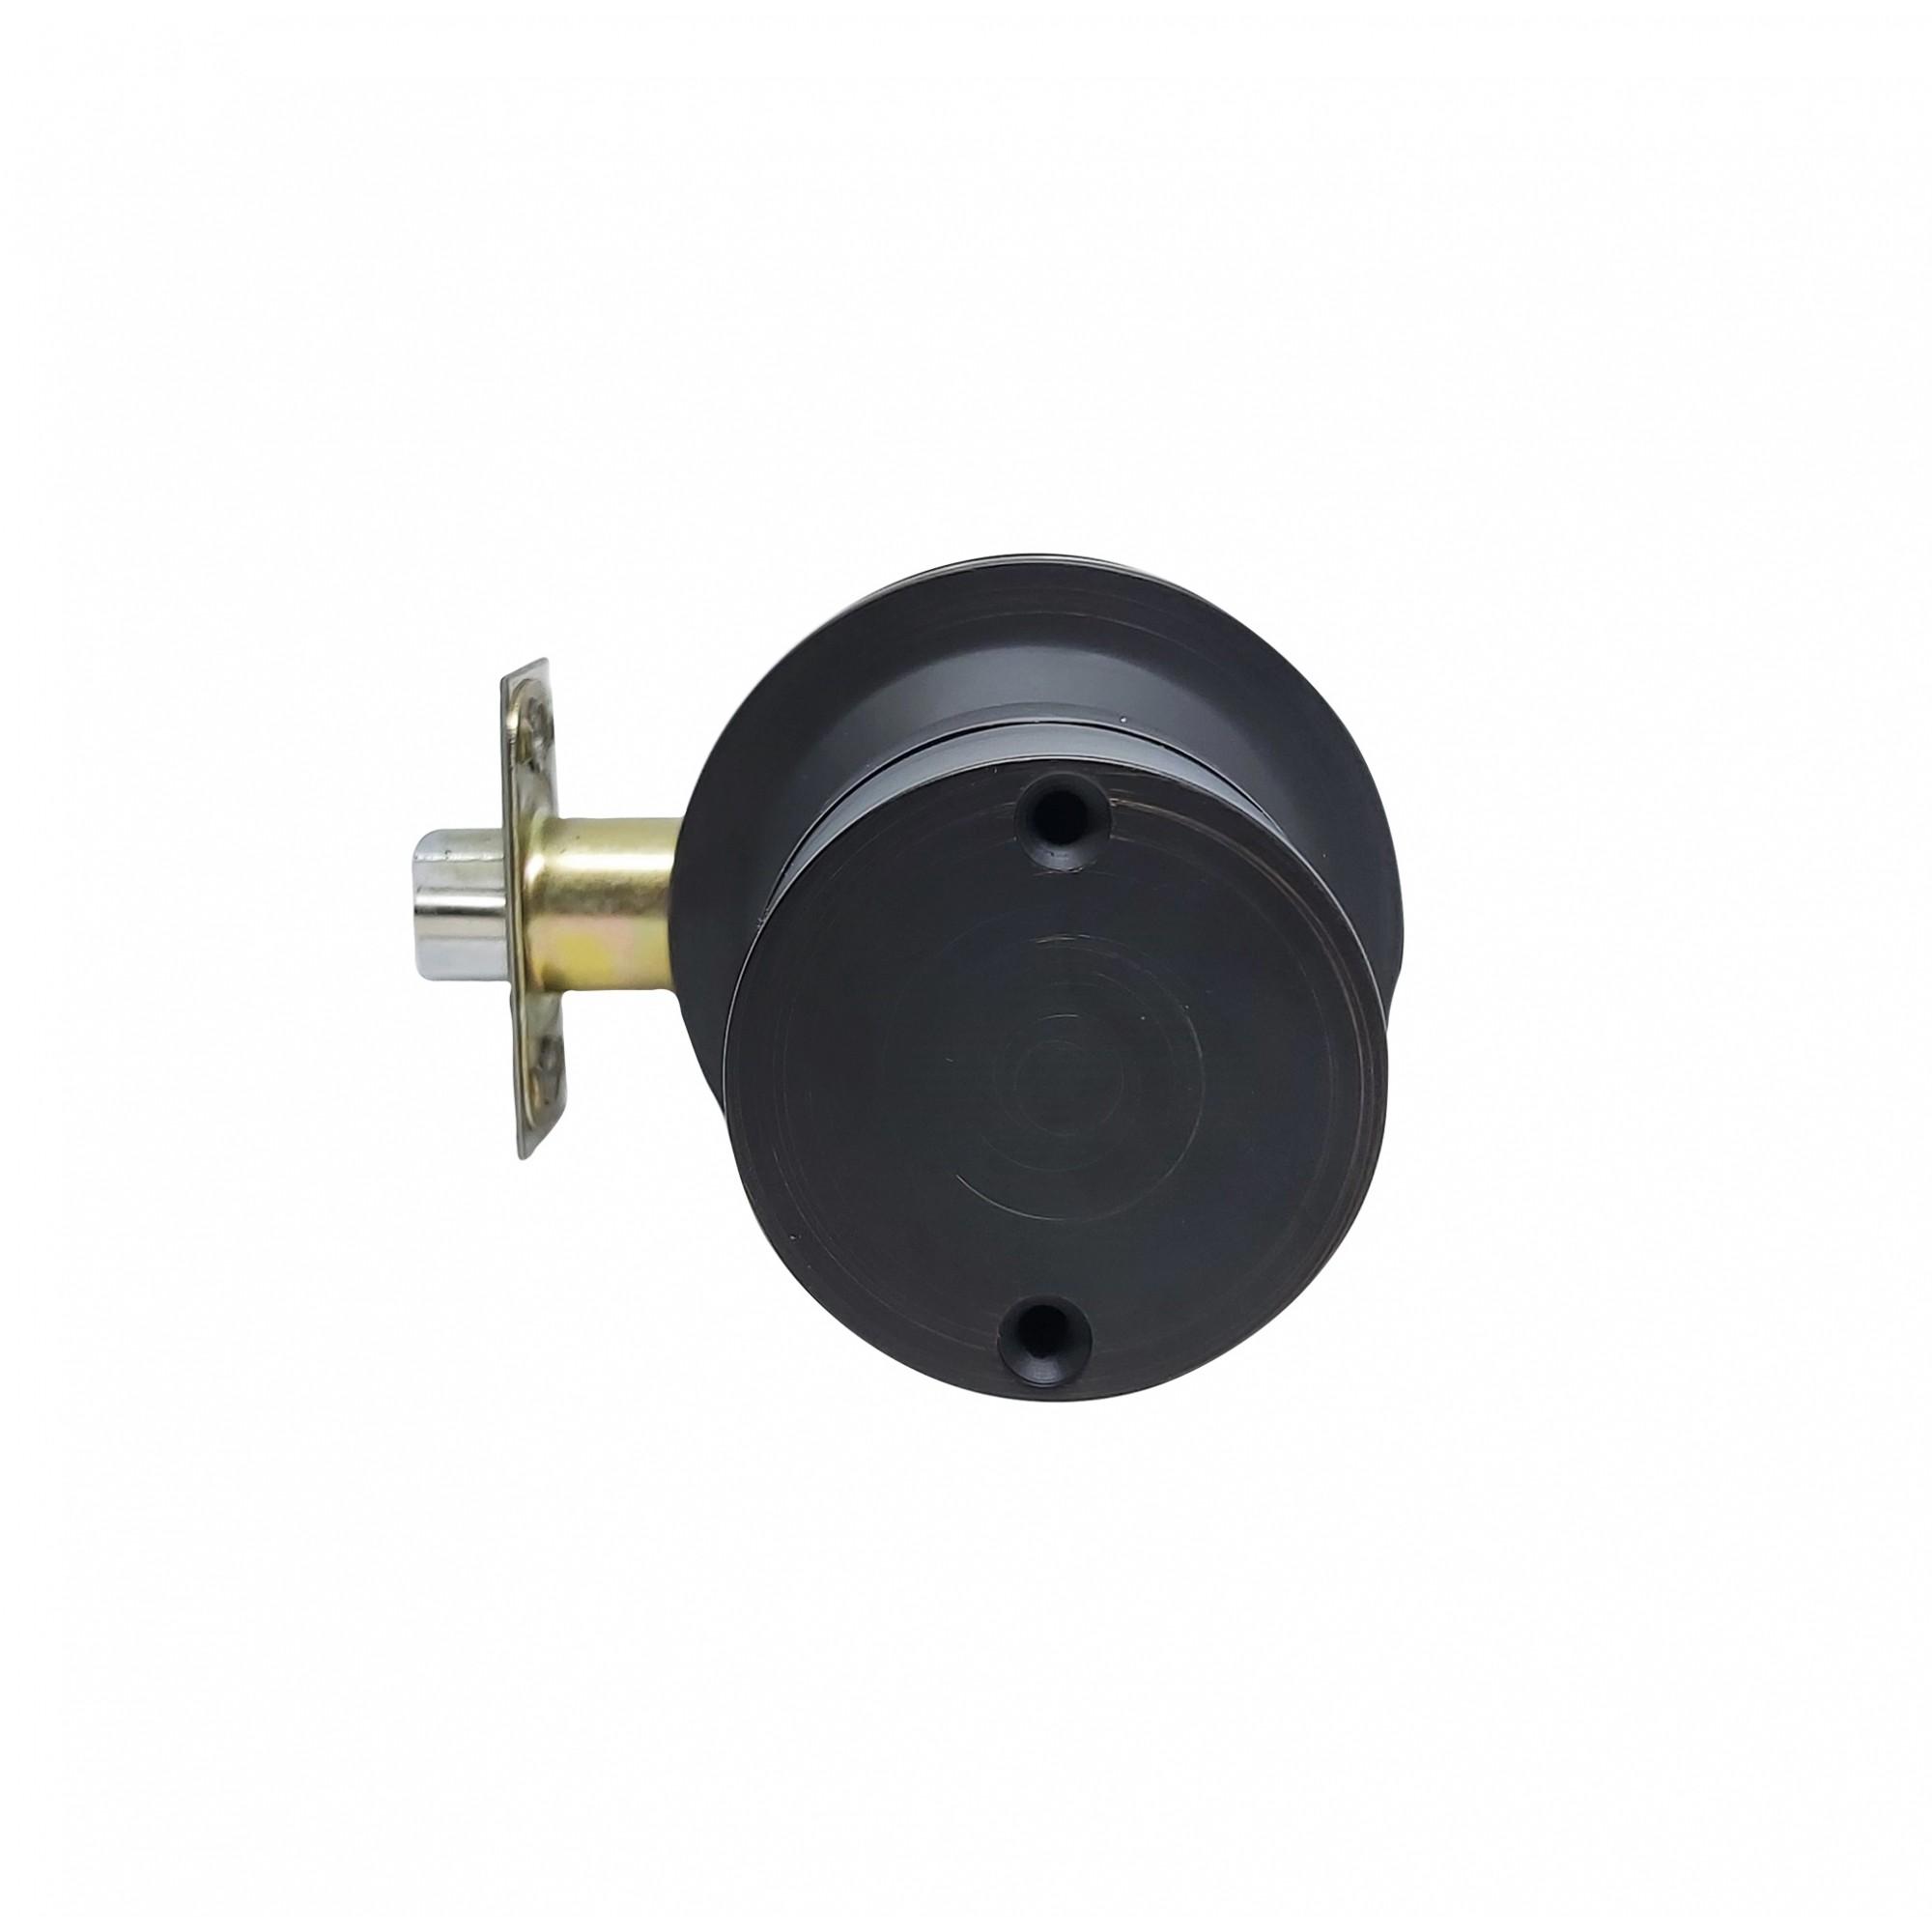 Fechadura Digital  TL-101 P/ Porta Divisoria Senha E Chave - 42115